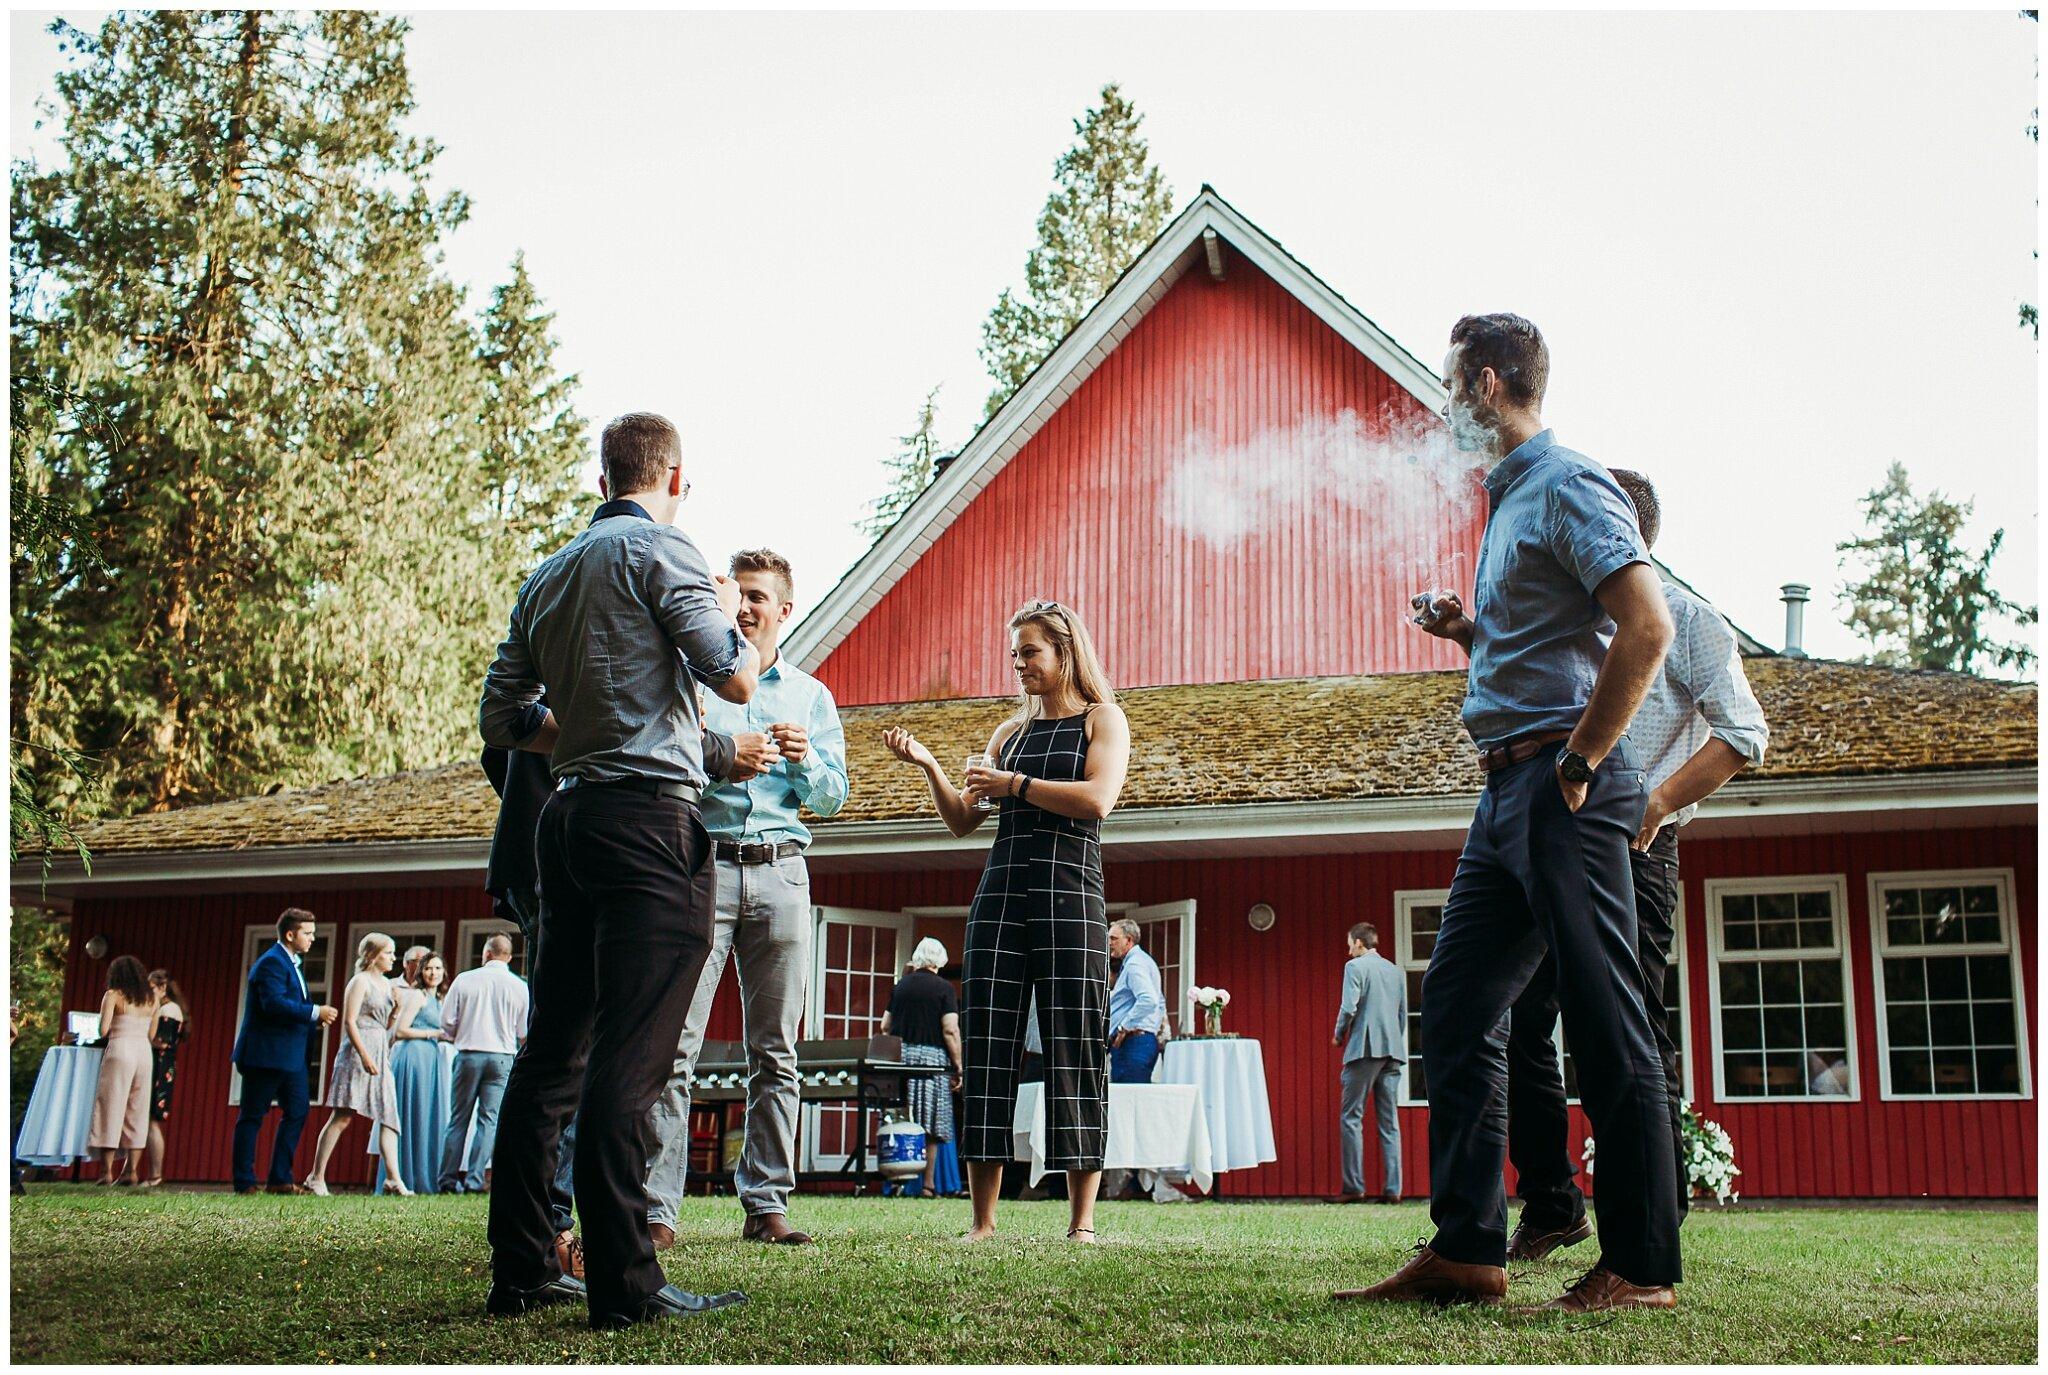 Eighteen Pastures Mission  BC Abbotsford BC Christian Wedding Photographer Summer Bride Groom Inspo_0037.jpg